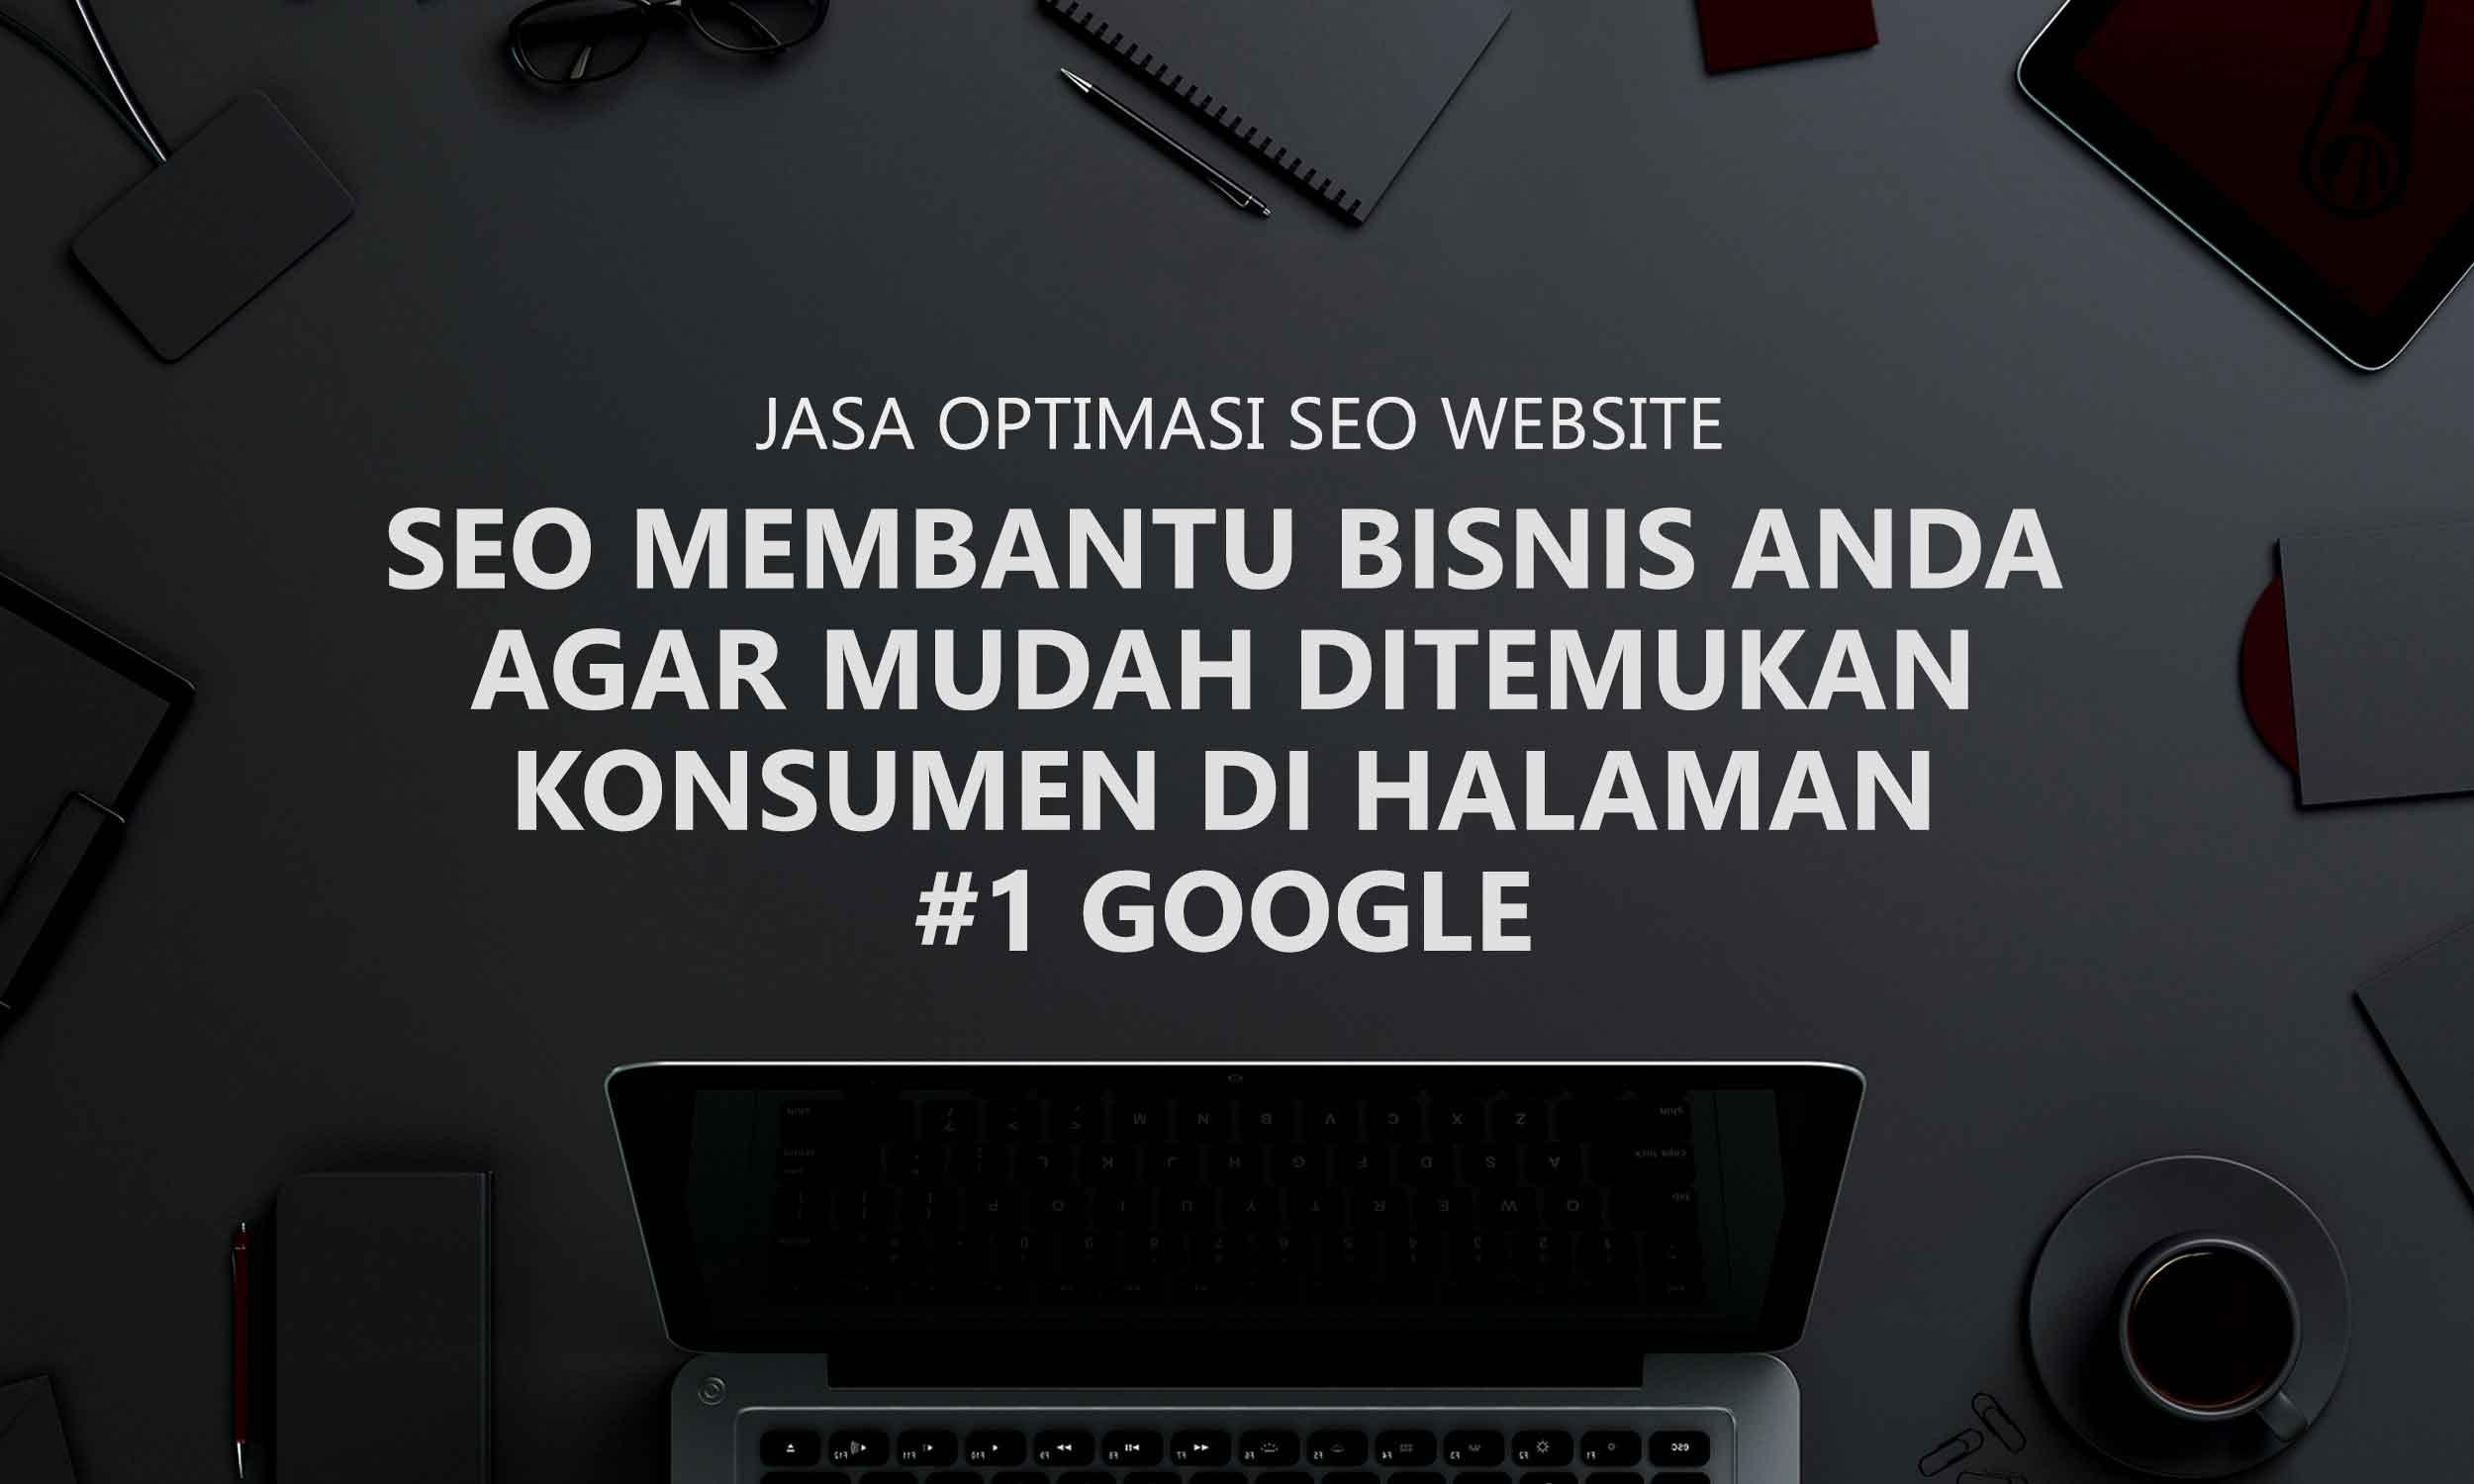 Jasa Optimasi SEO Website